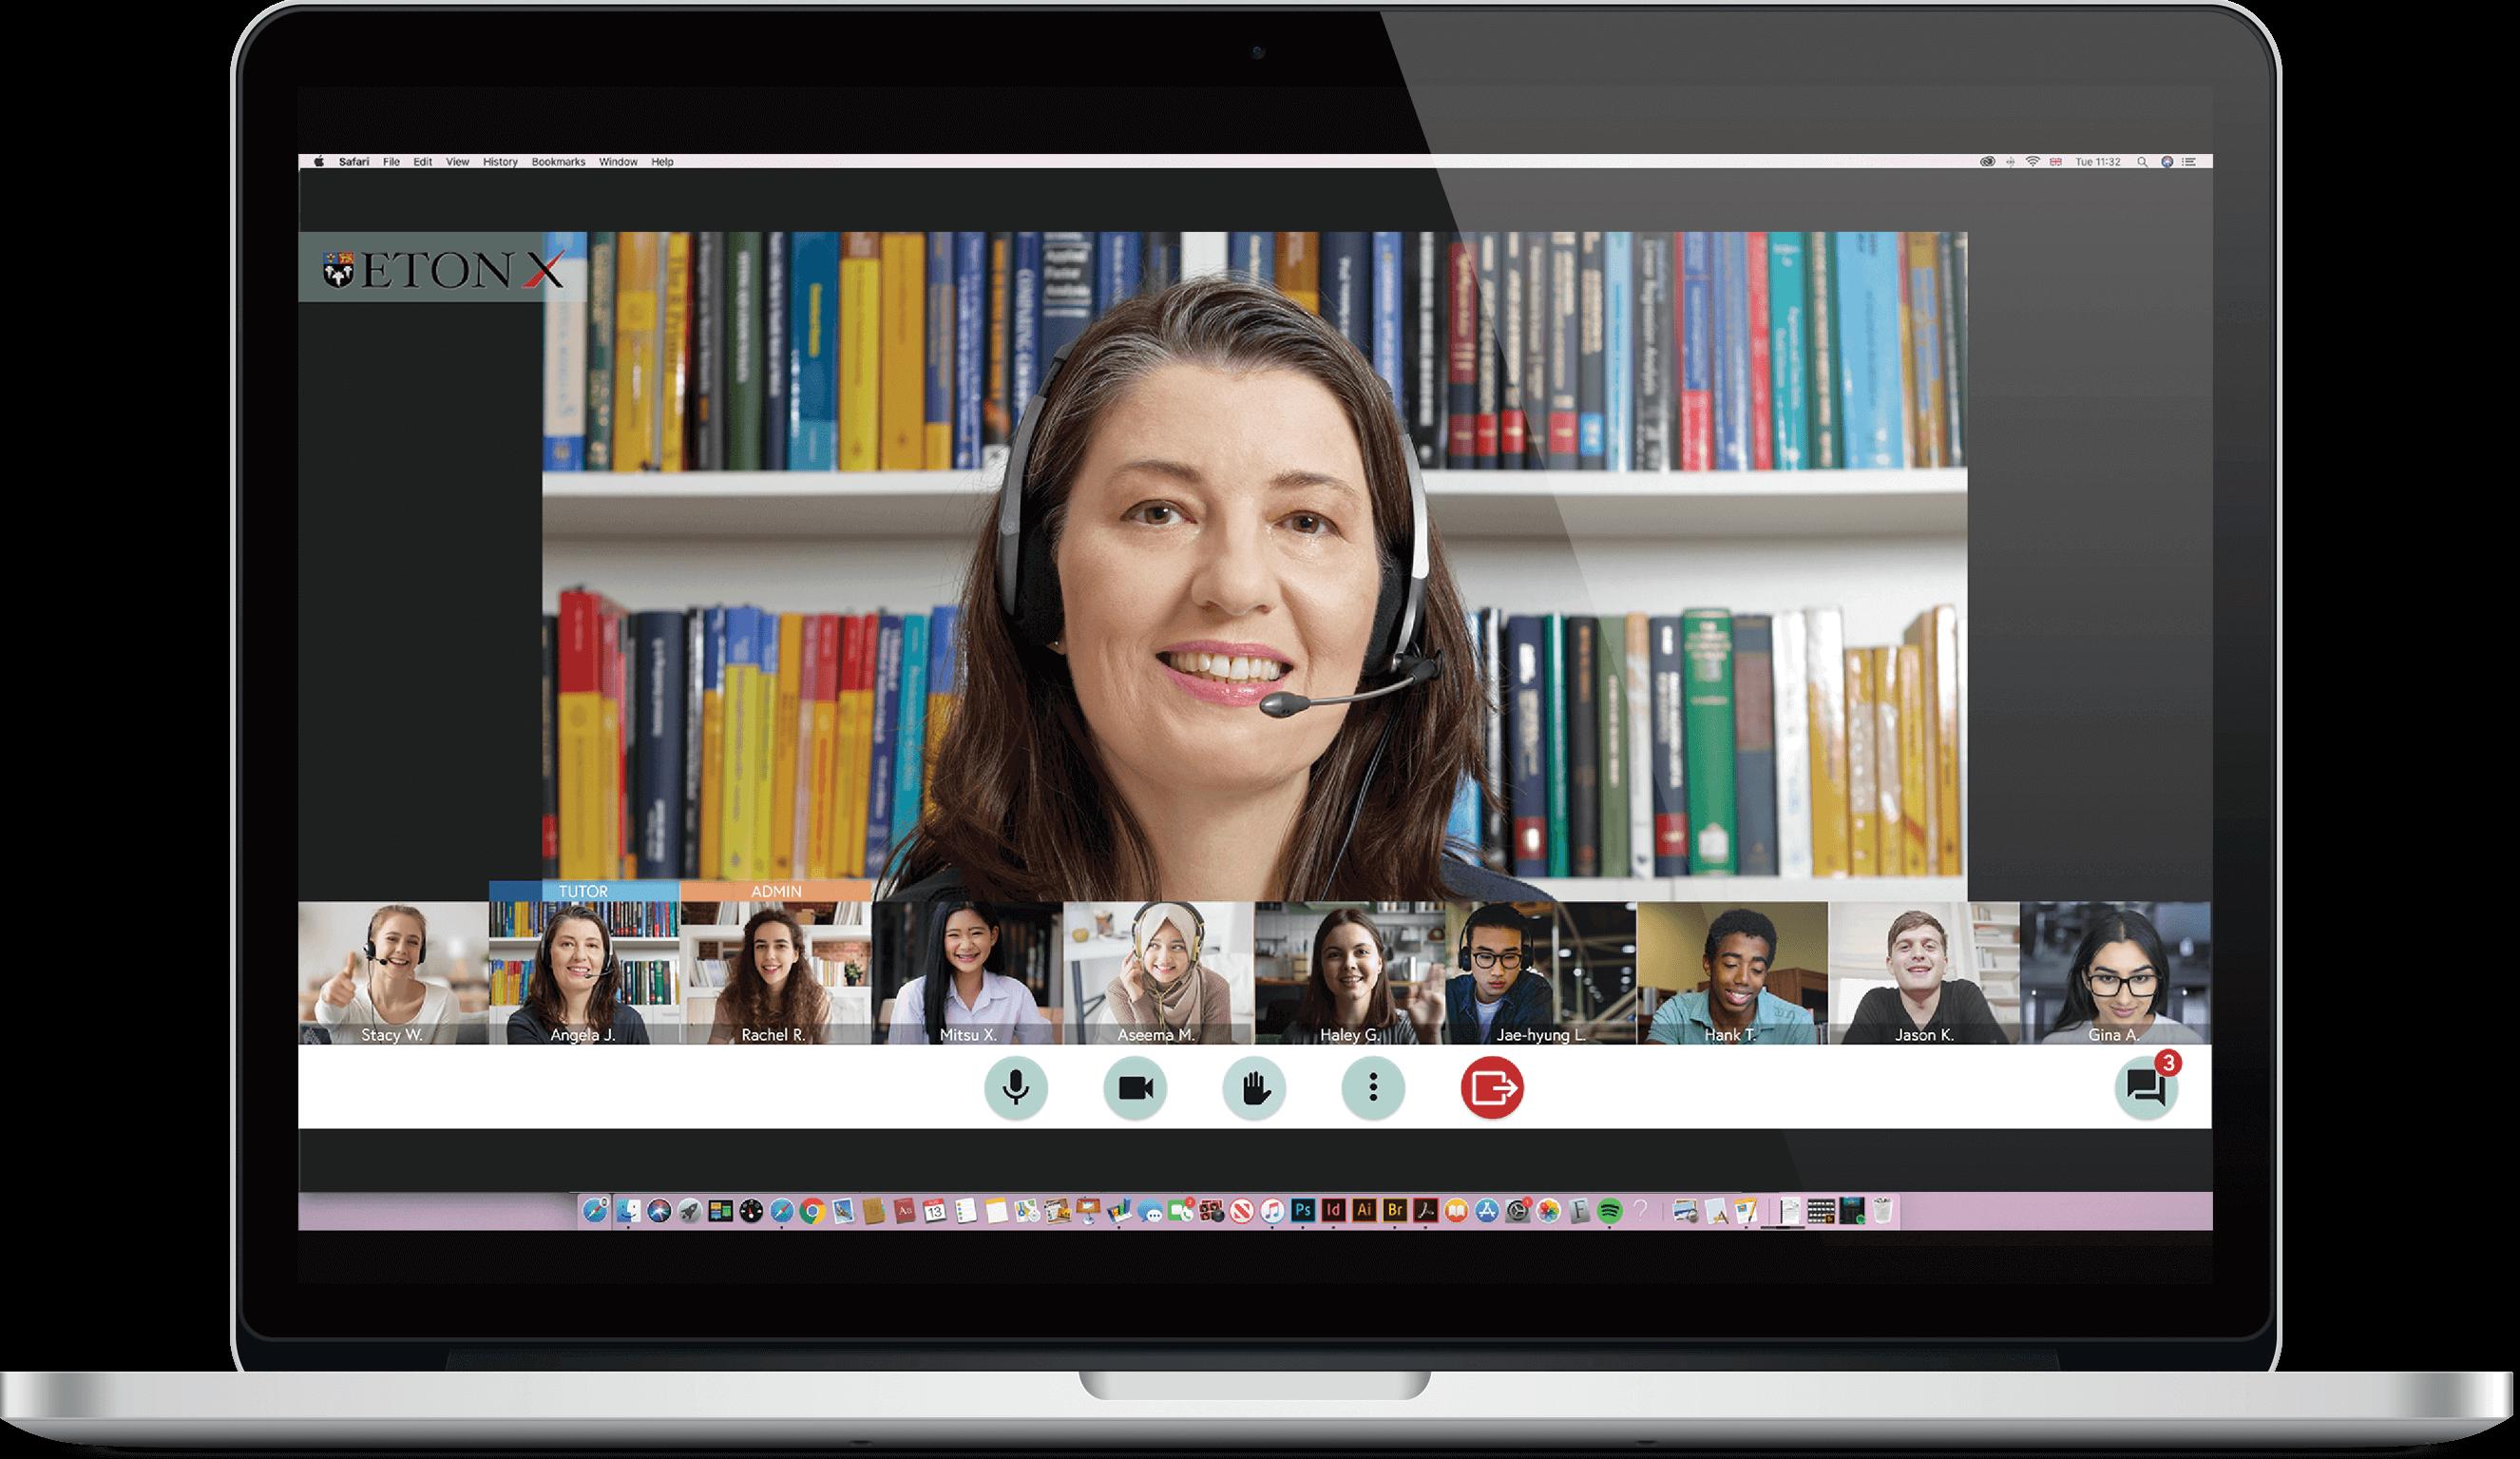 EtonX-virtual-classroom-2 (1) copy